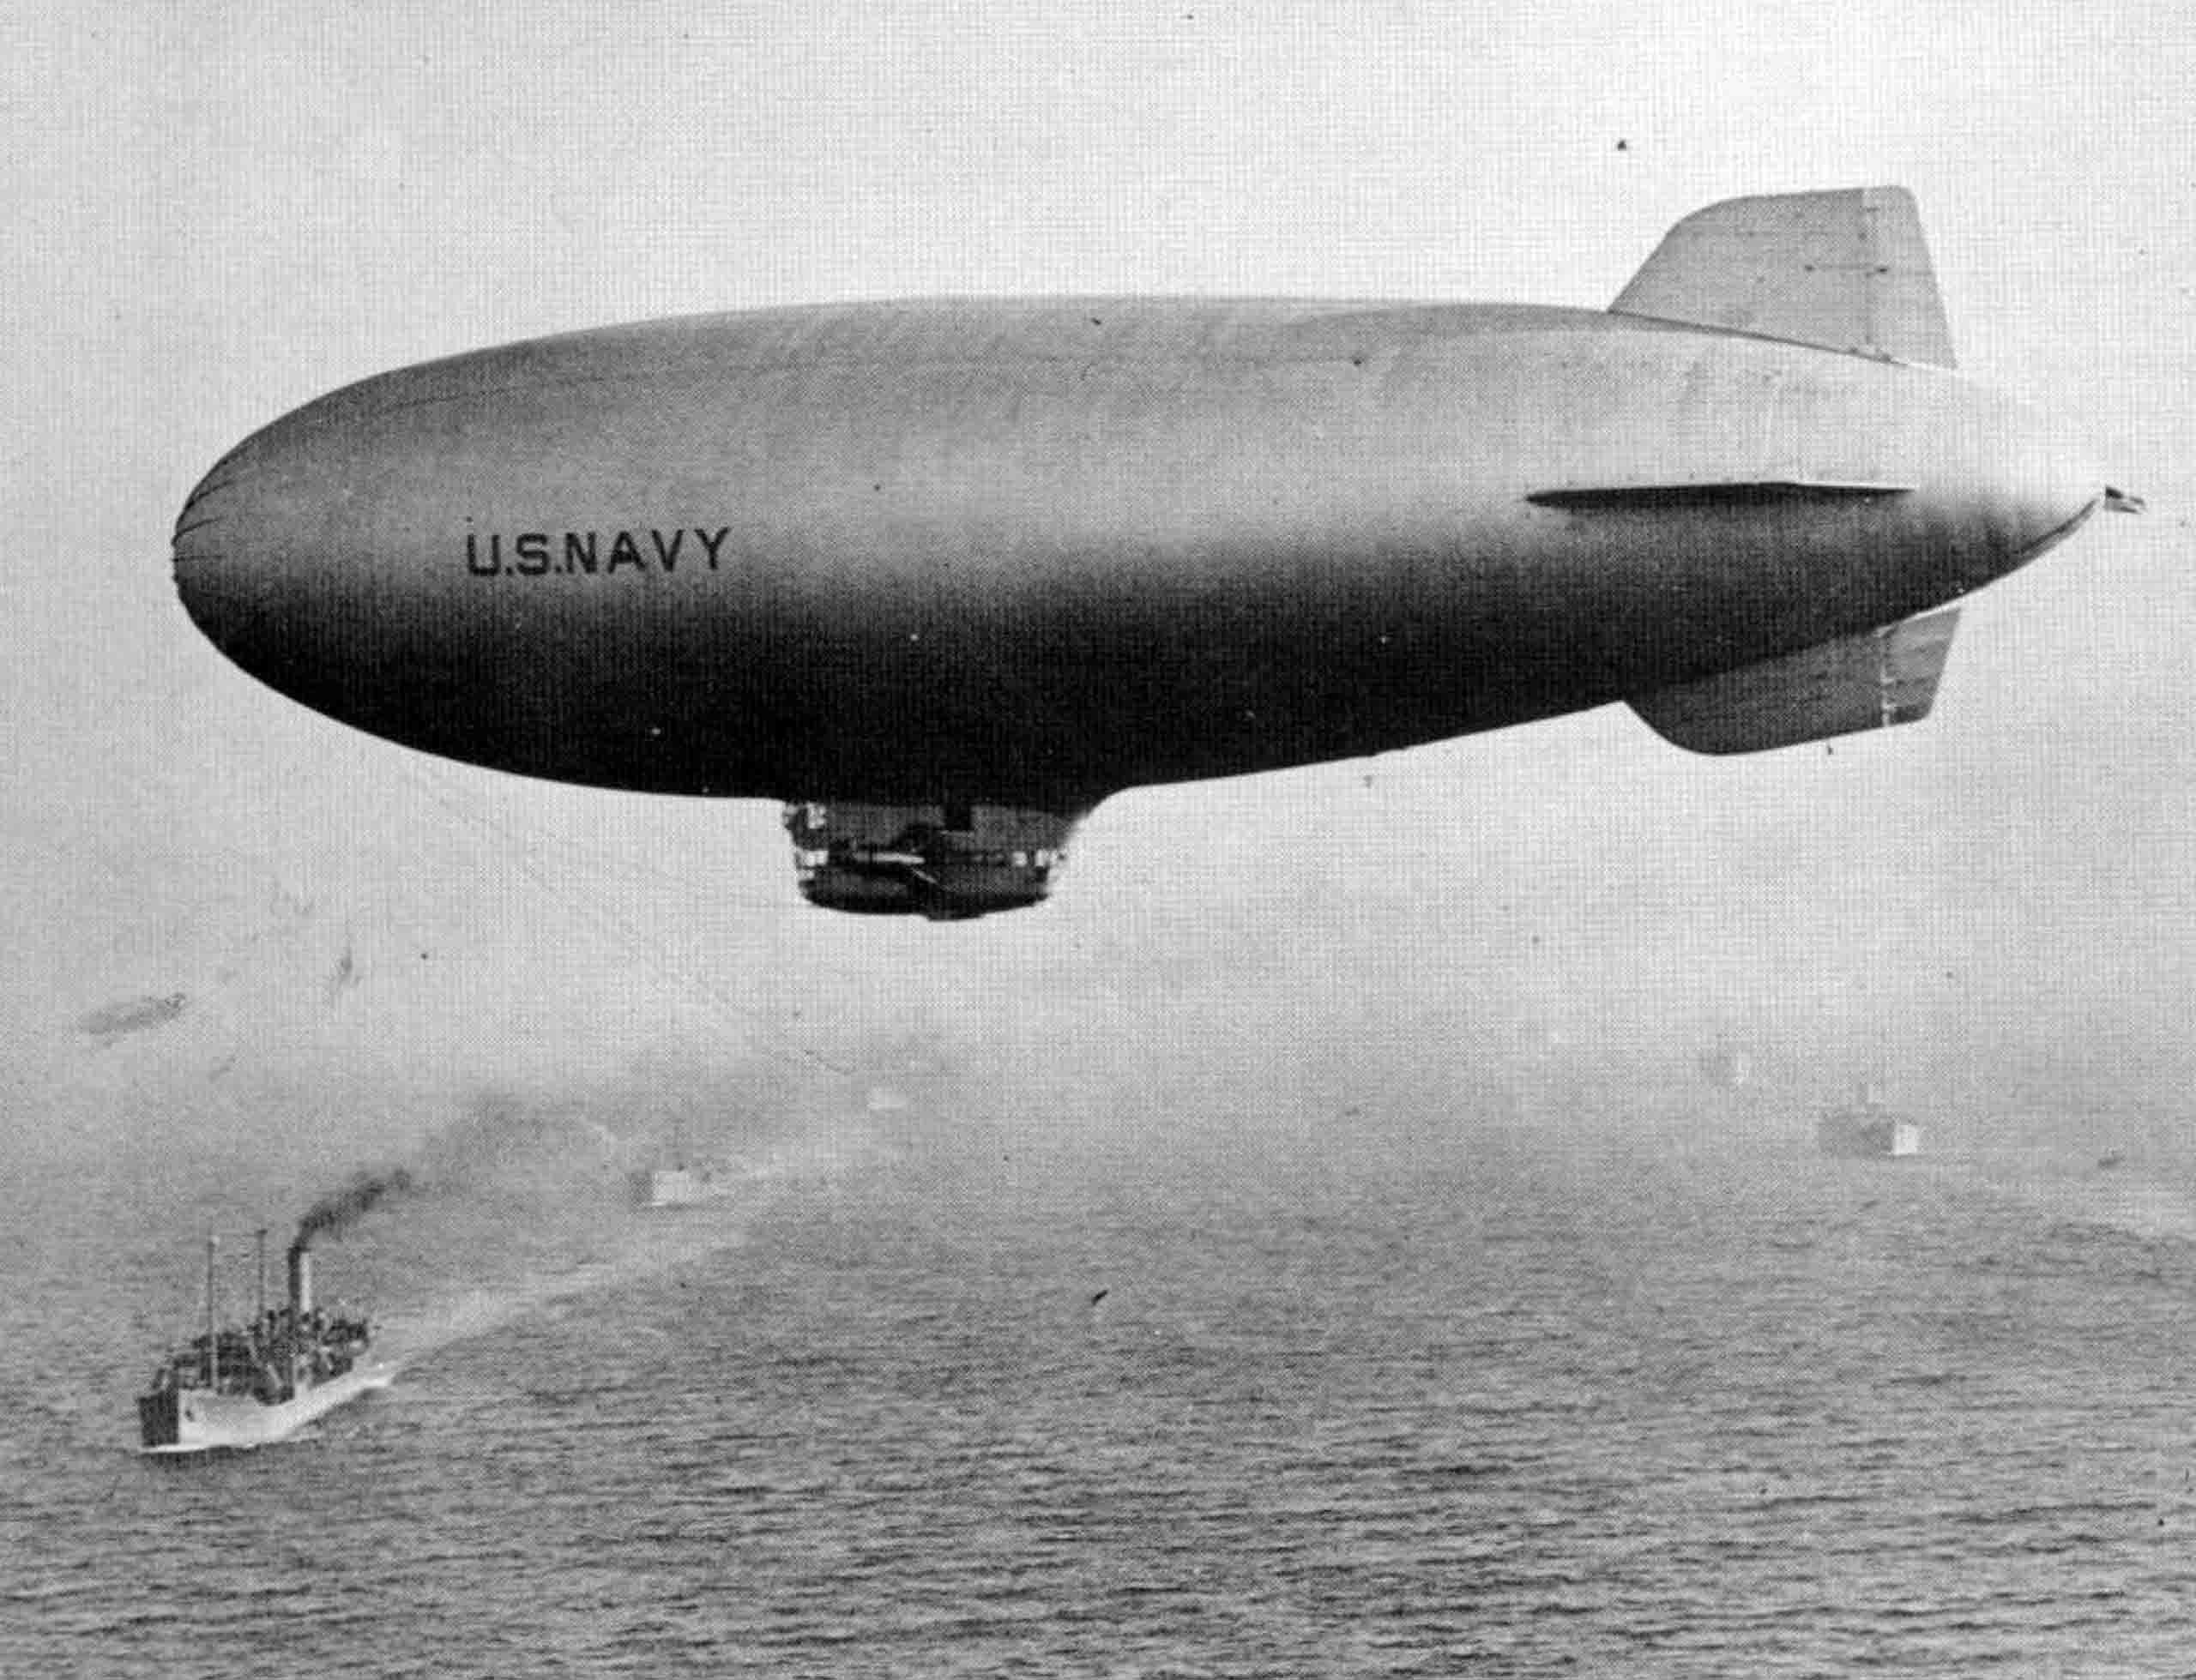 K-class patrol airship